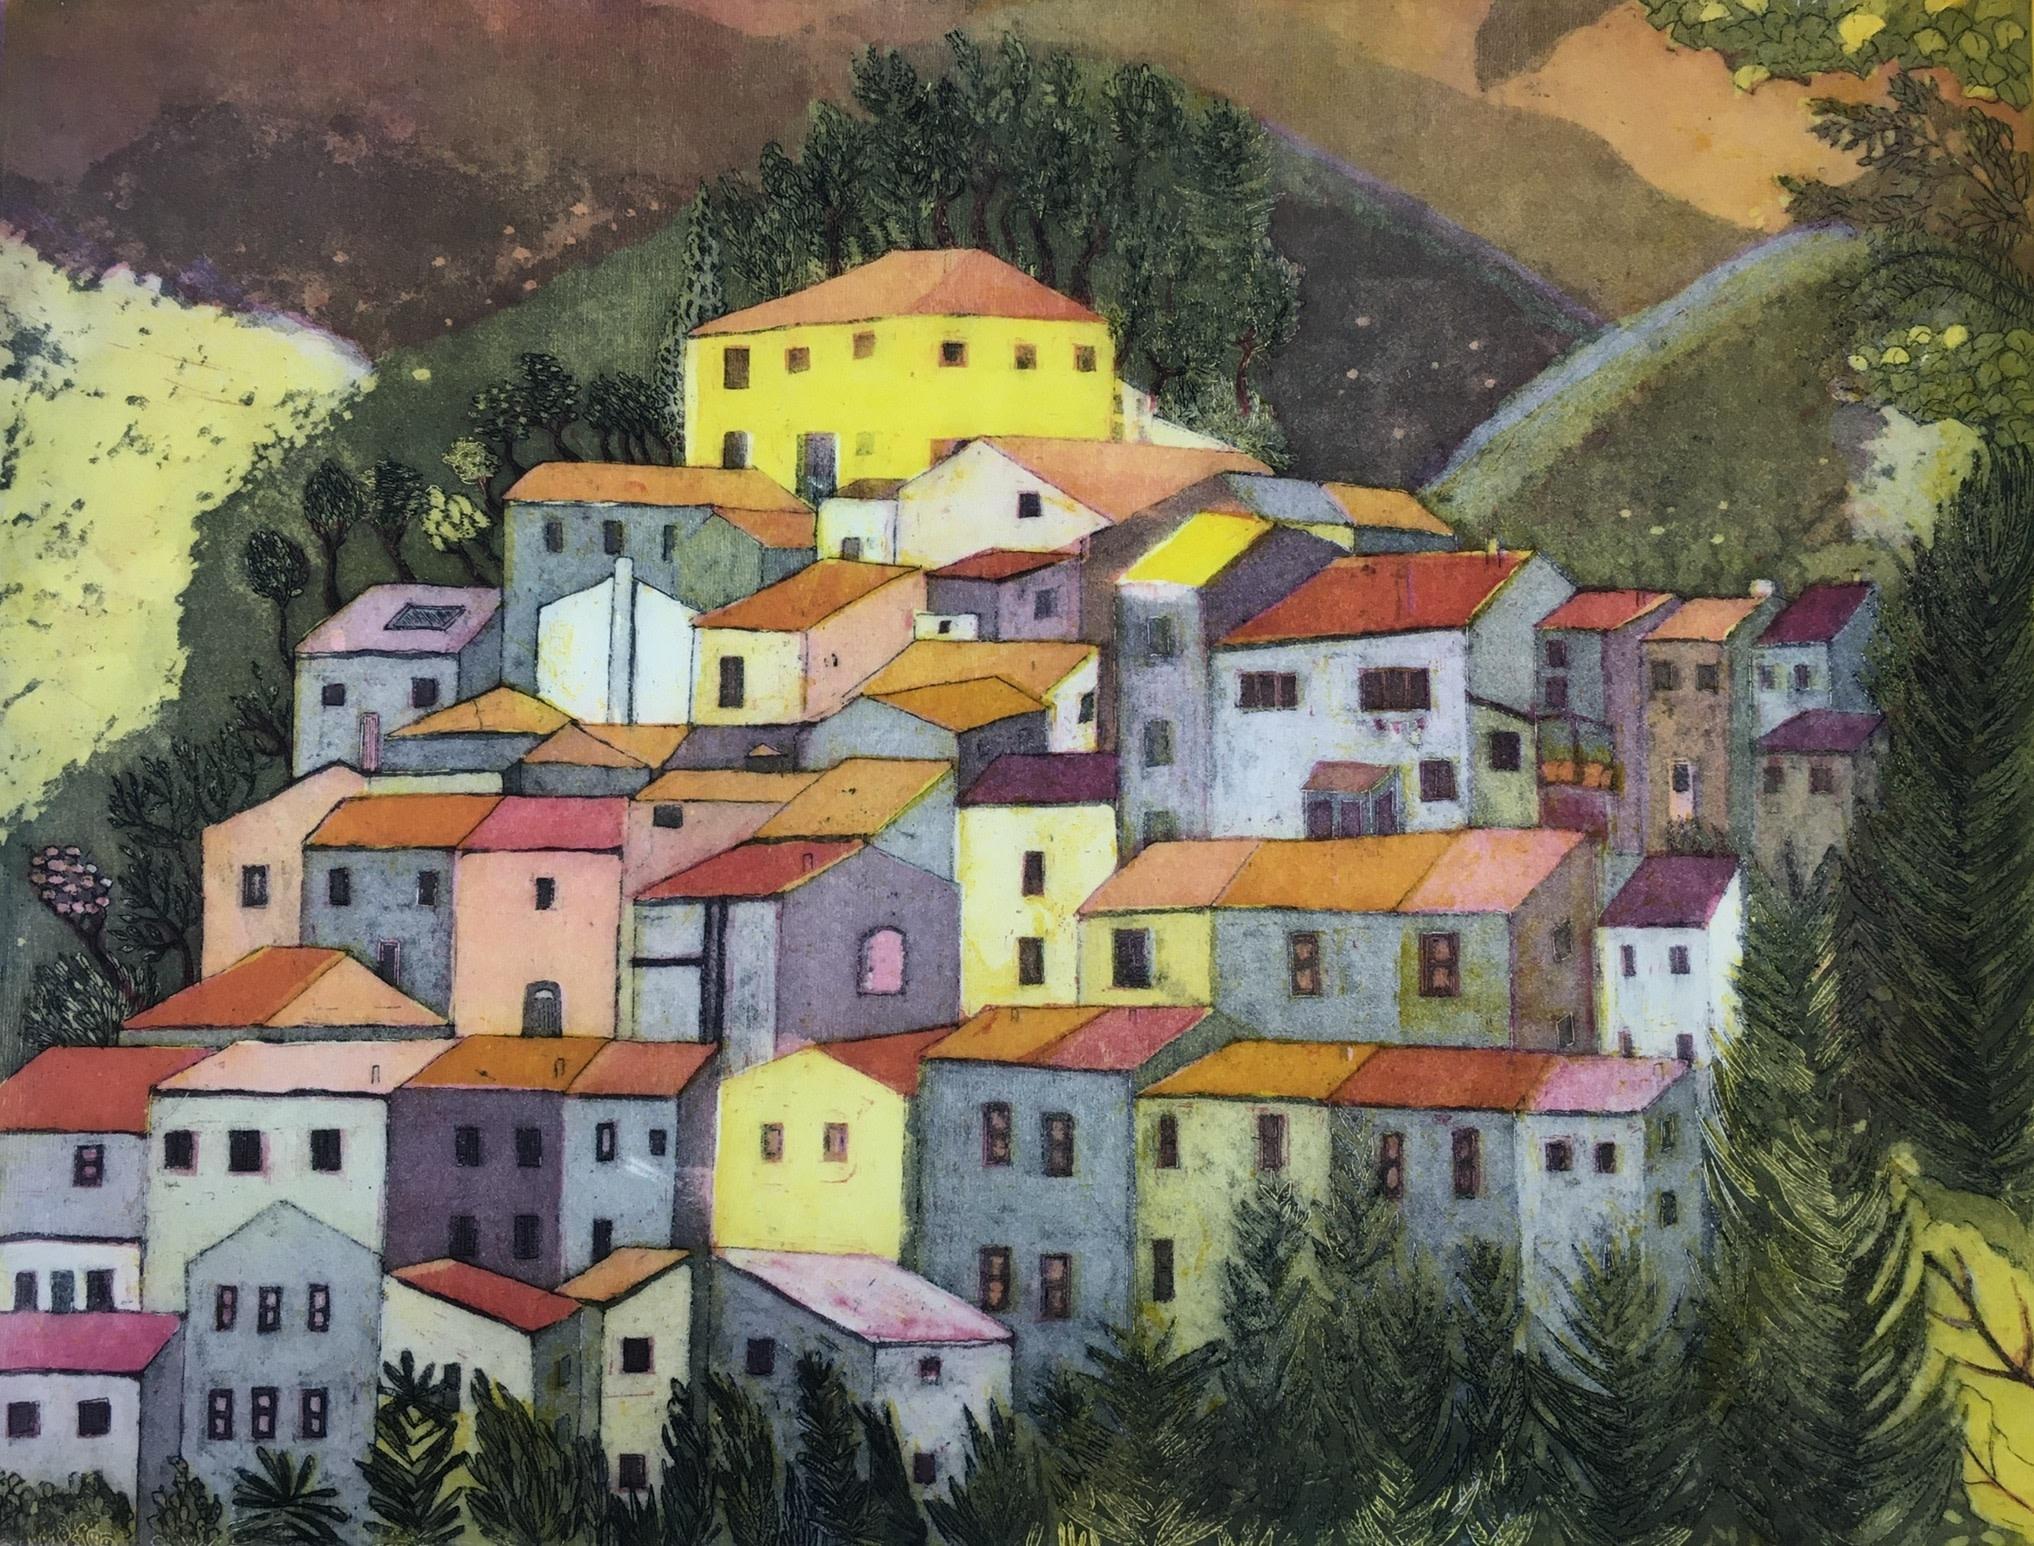 "<span class=""link fancybox-details-link""><a href=""/exhibitions/20/works/artworks_standalone10698/"">View Detail Page</a></span><div class=""artist""><span class=""artist""><strong>Karen Keogh RE</strong></span></div><div class=""title""><em>Mezzogiorno, Toscana</em></div><div class=""medium"">etching</div><div class=""dimensions"">30 x 40 cm image size</div><div class=""edition_details"">edition of 75</div>"